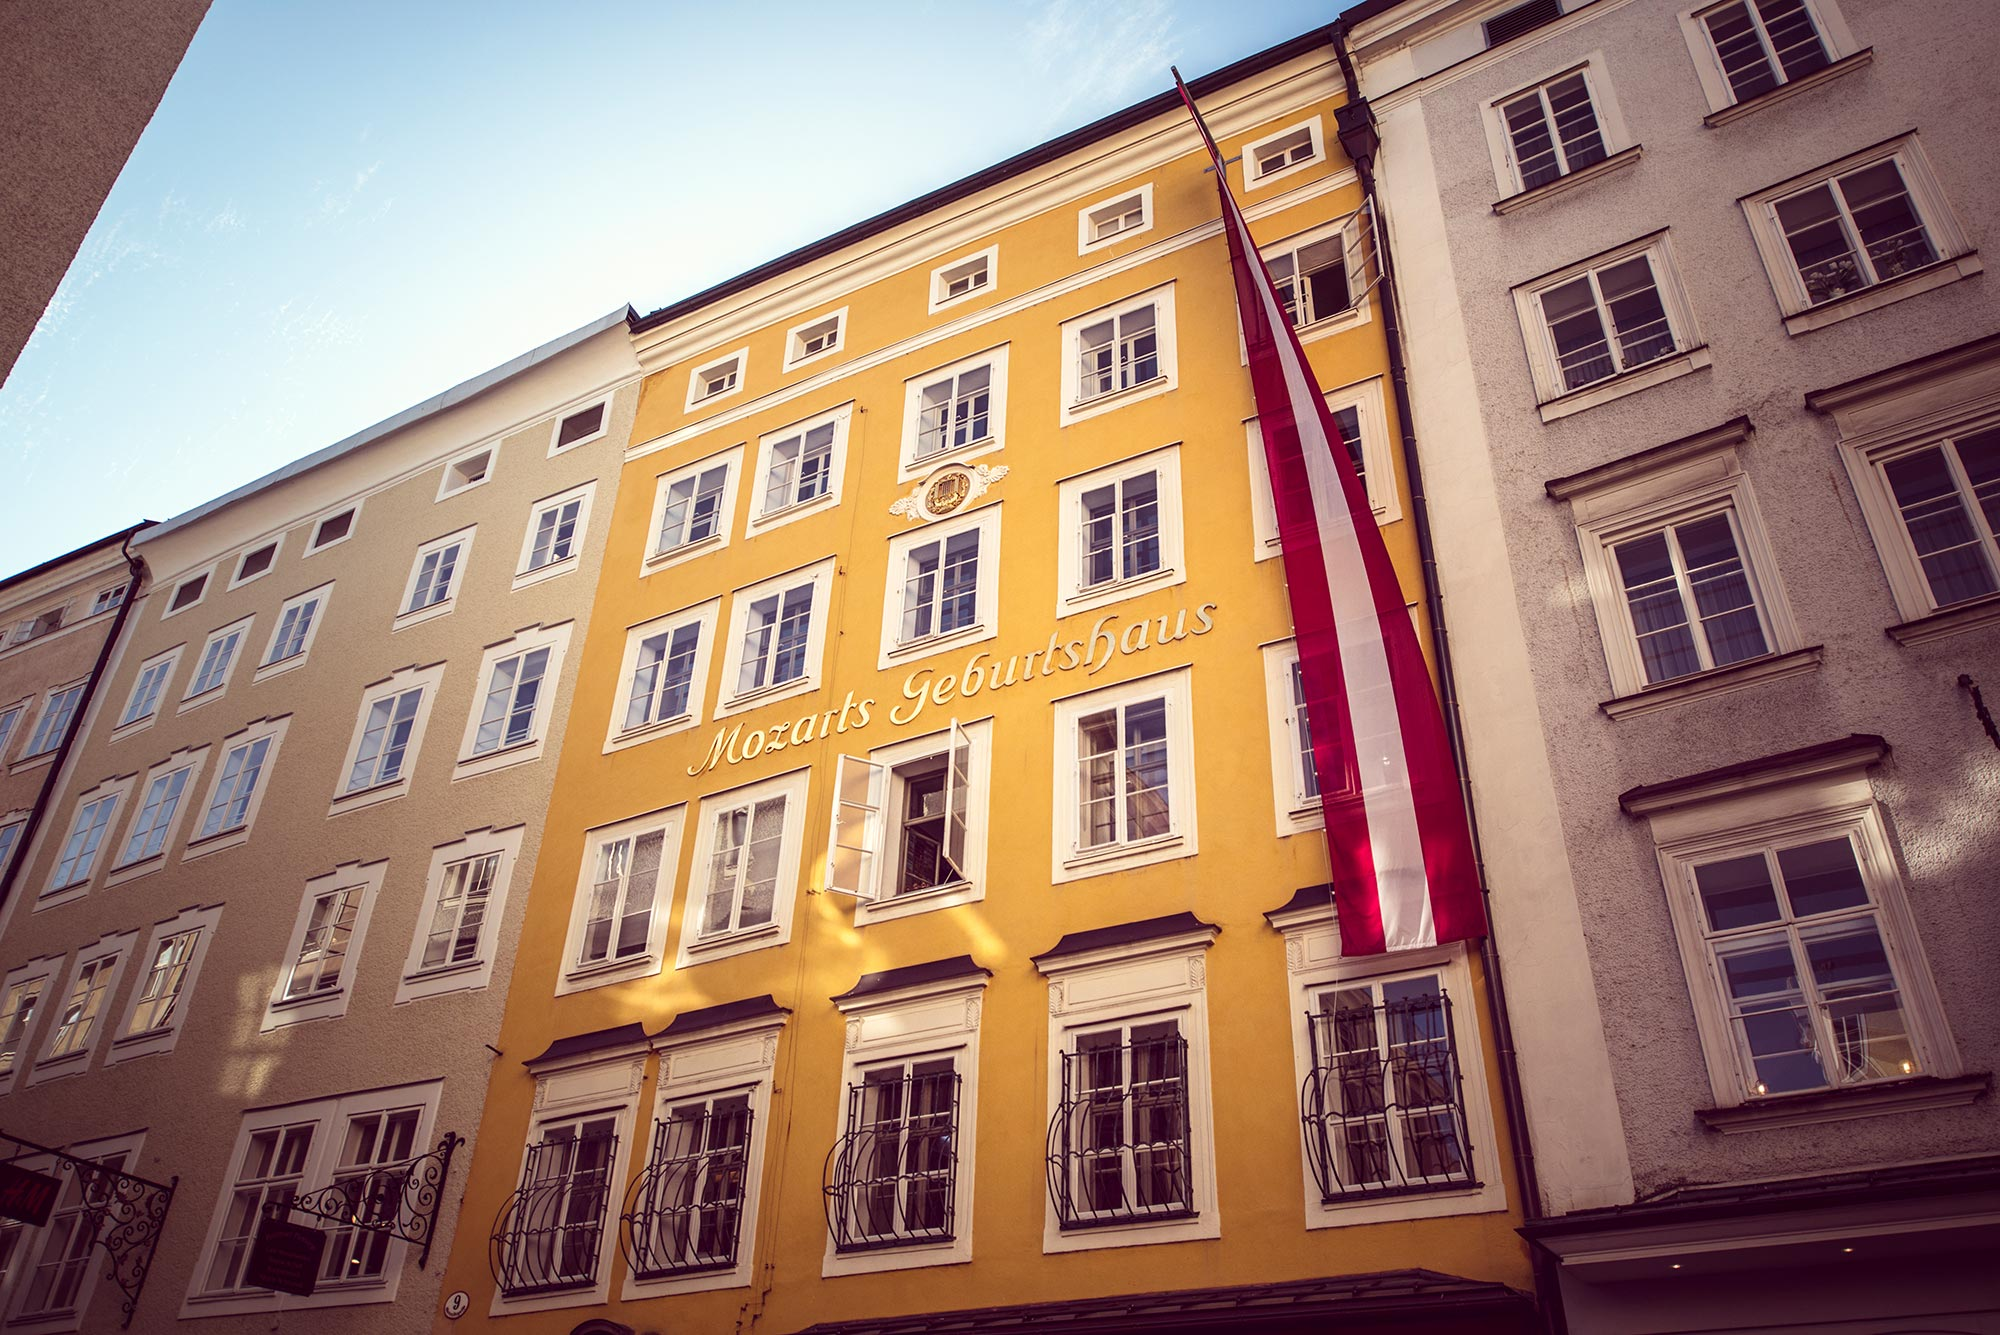 Mozart's Birthplace in Salzburg, Austria.